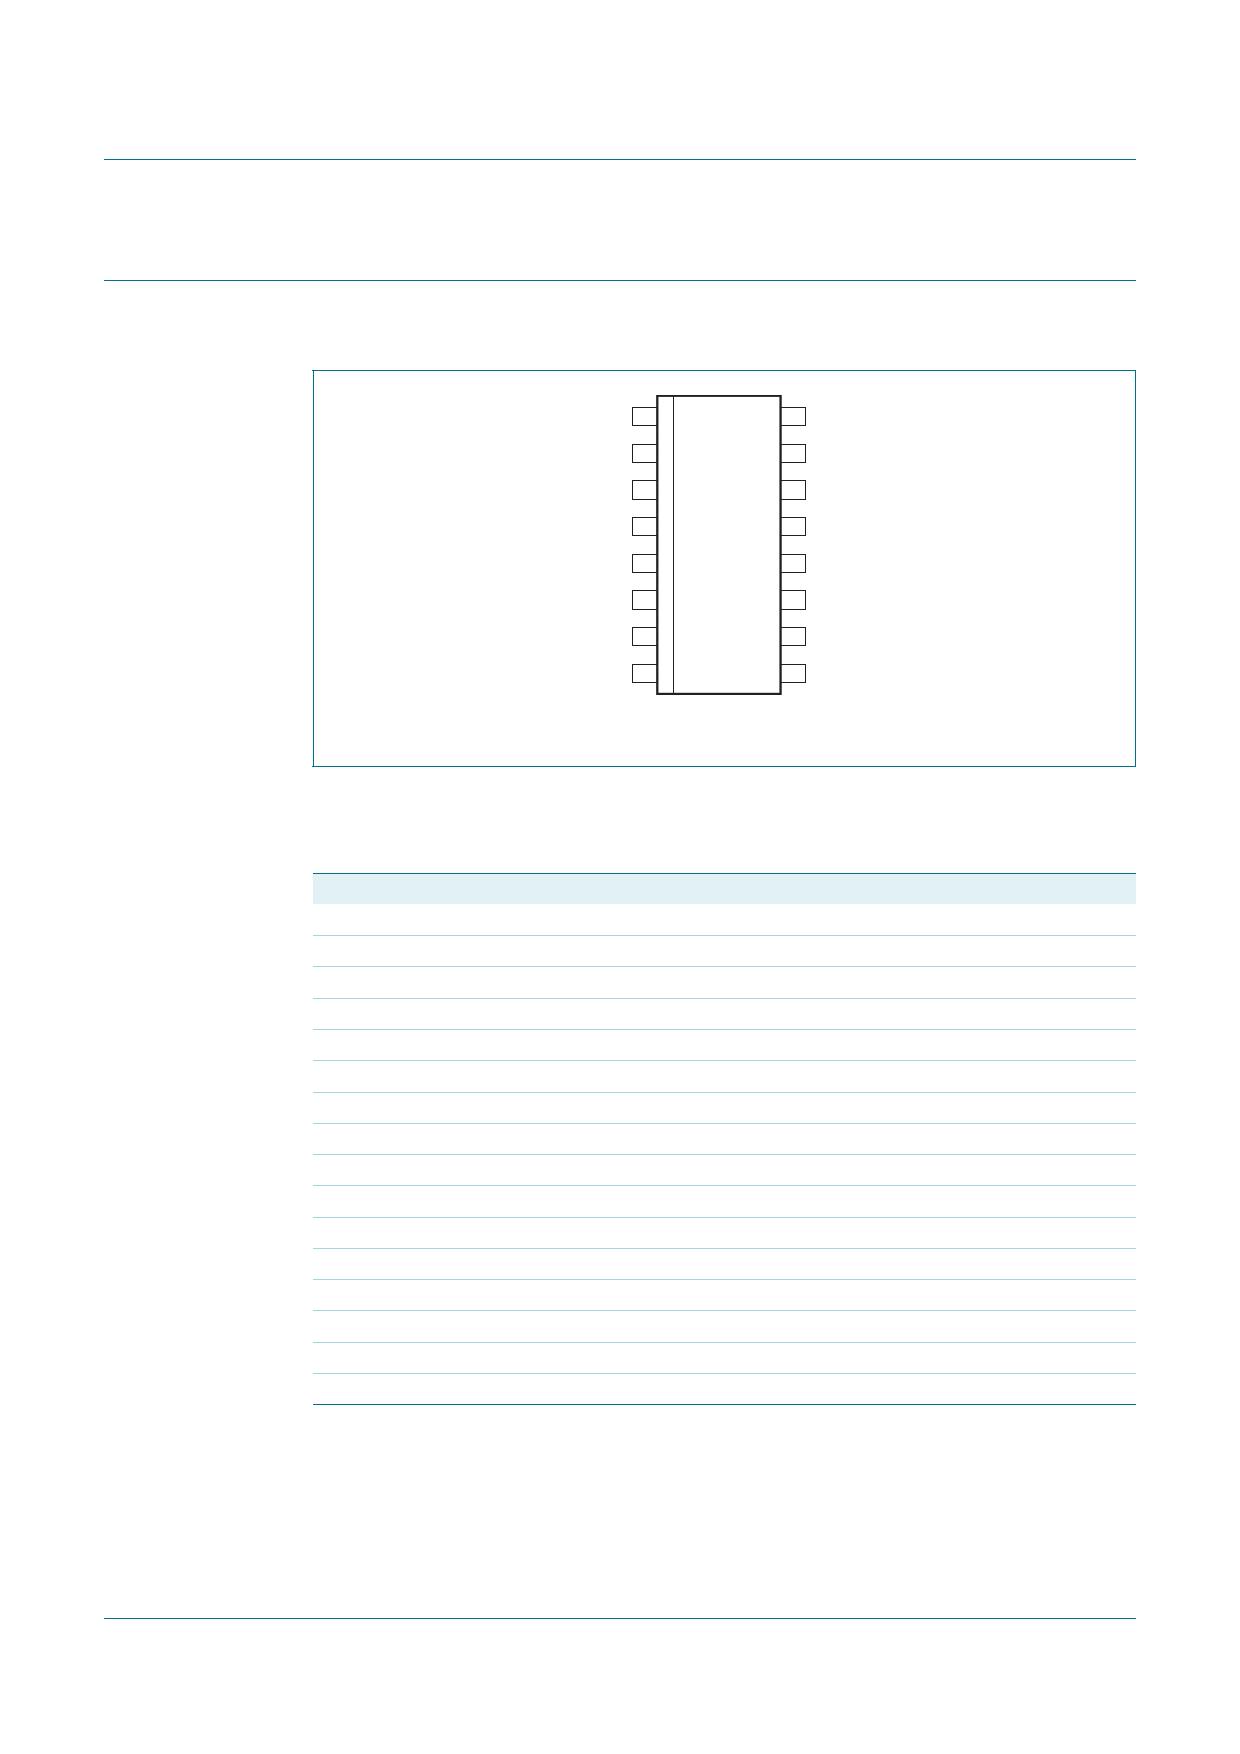 TEA1753T pdf, arduino